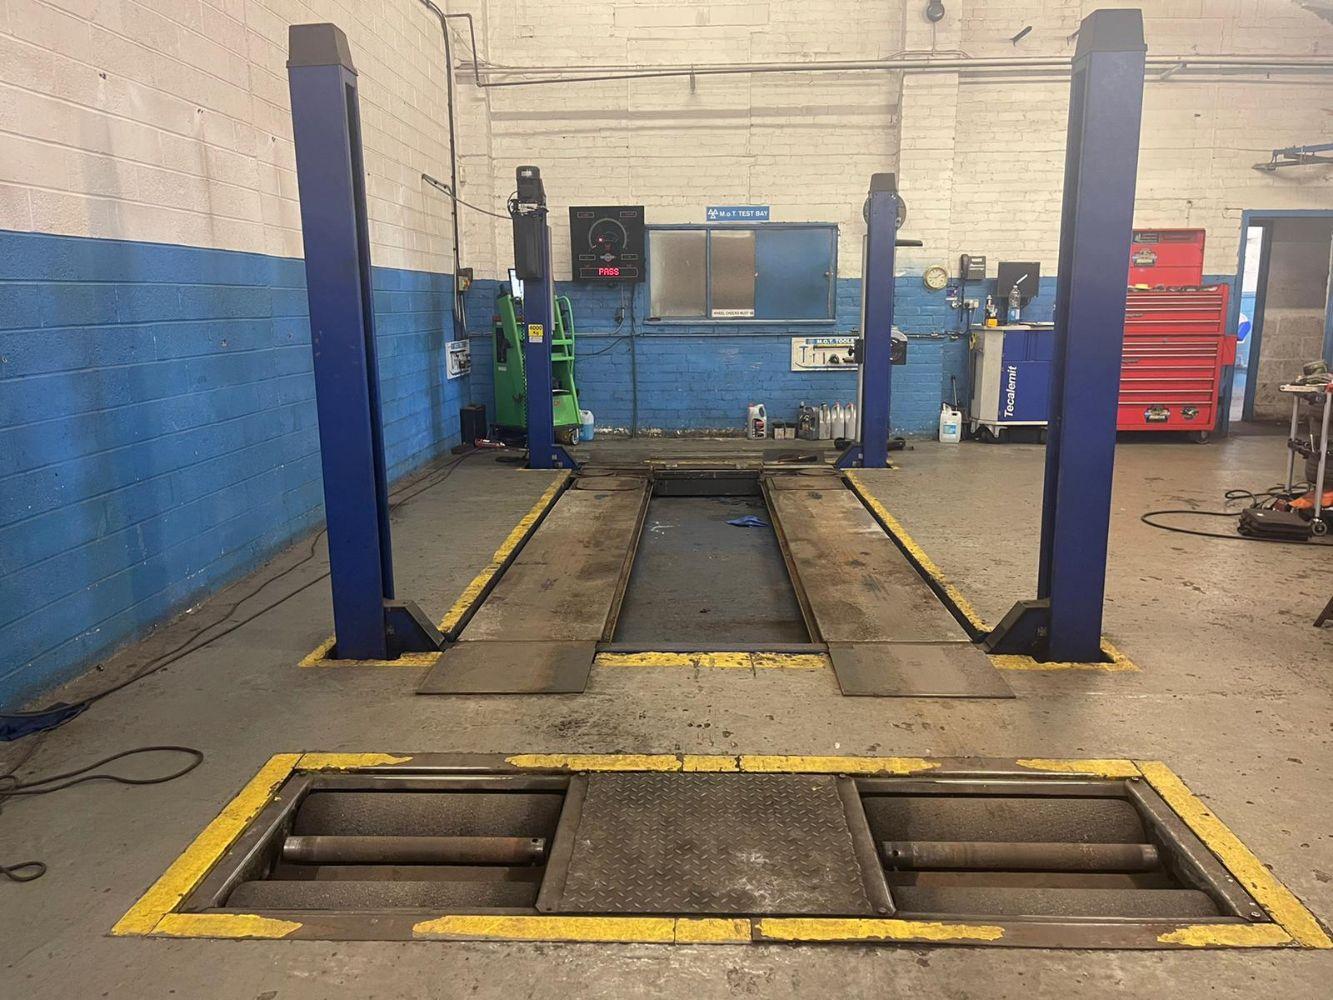 Short Notice Sale - The Assets of an MOT Garage and Workshop